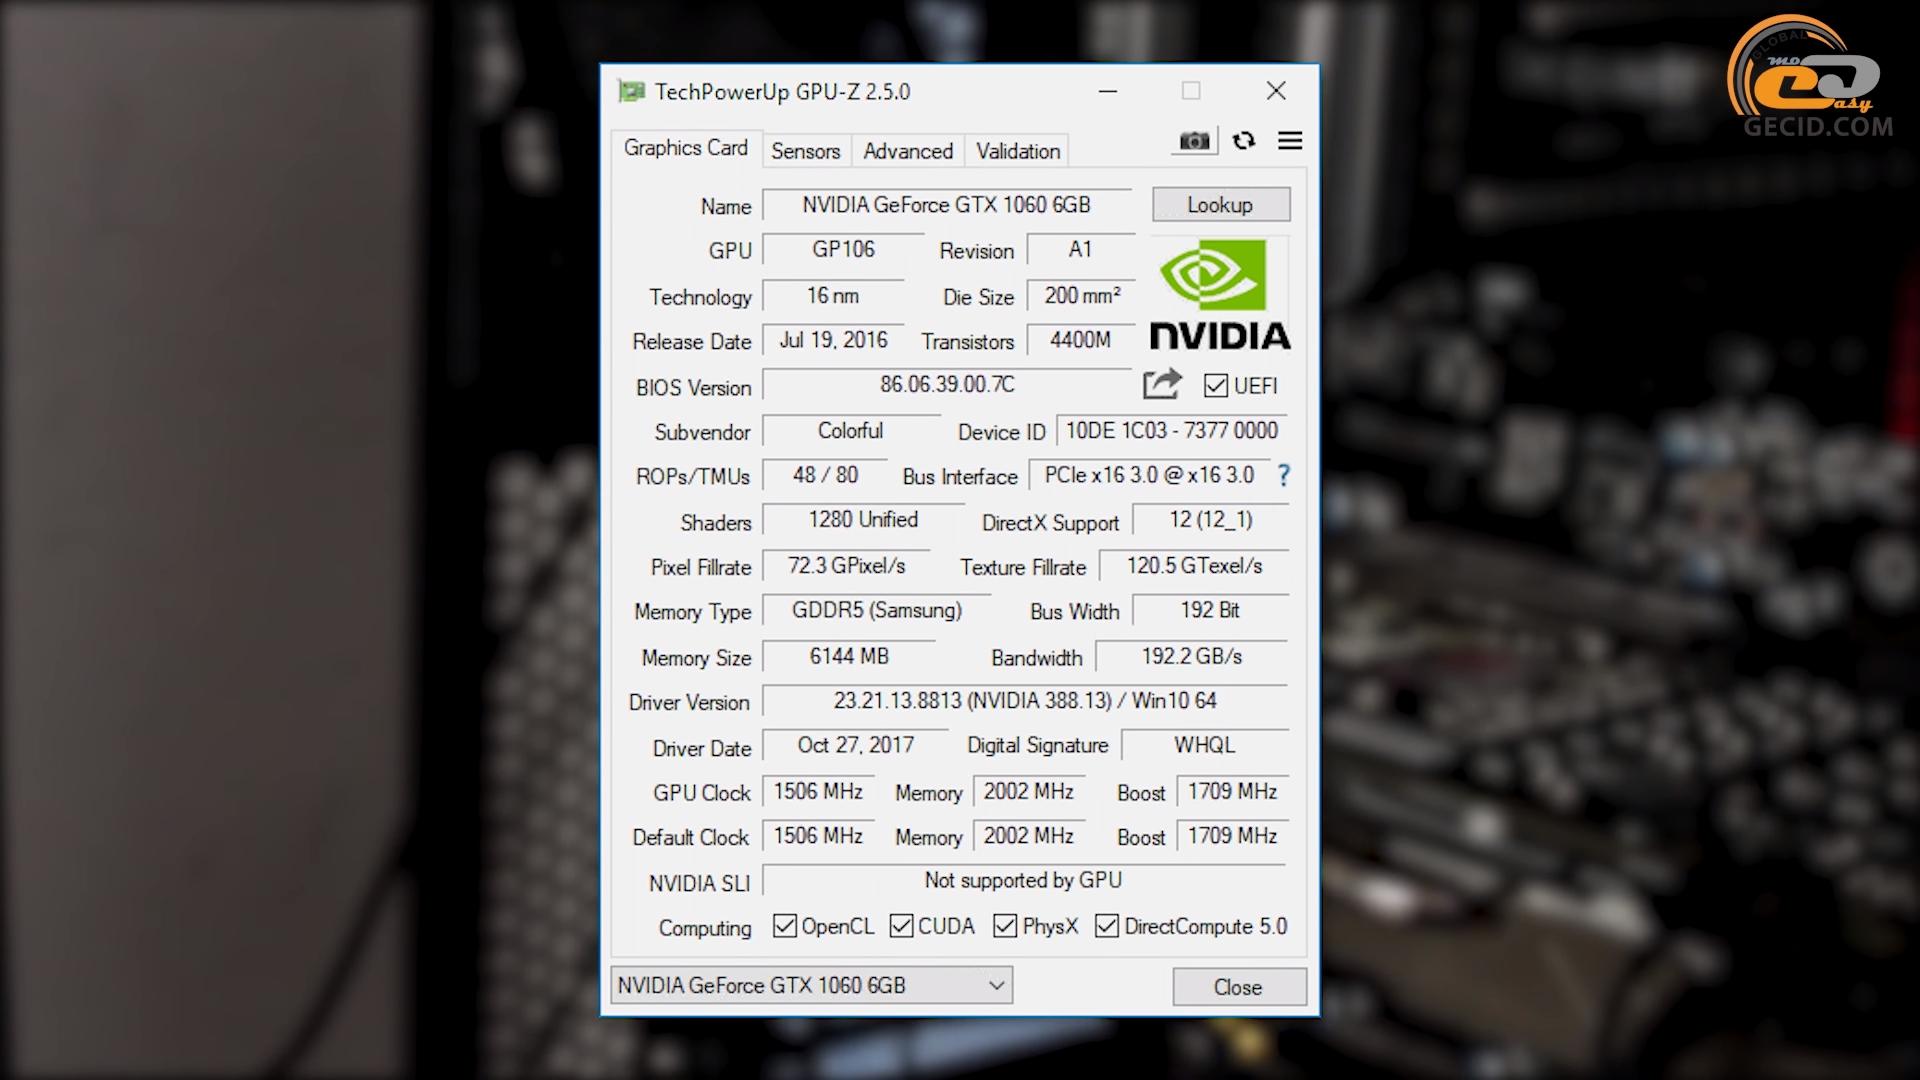 Разгон AMD Ryzen 5 1400 в системе с GeForce GTX 1060 6GB